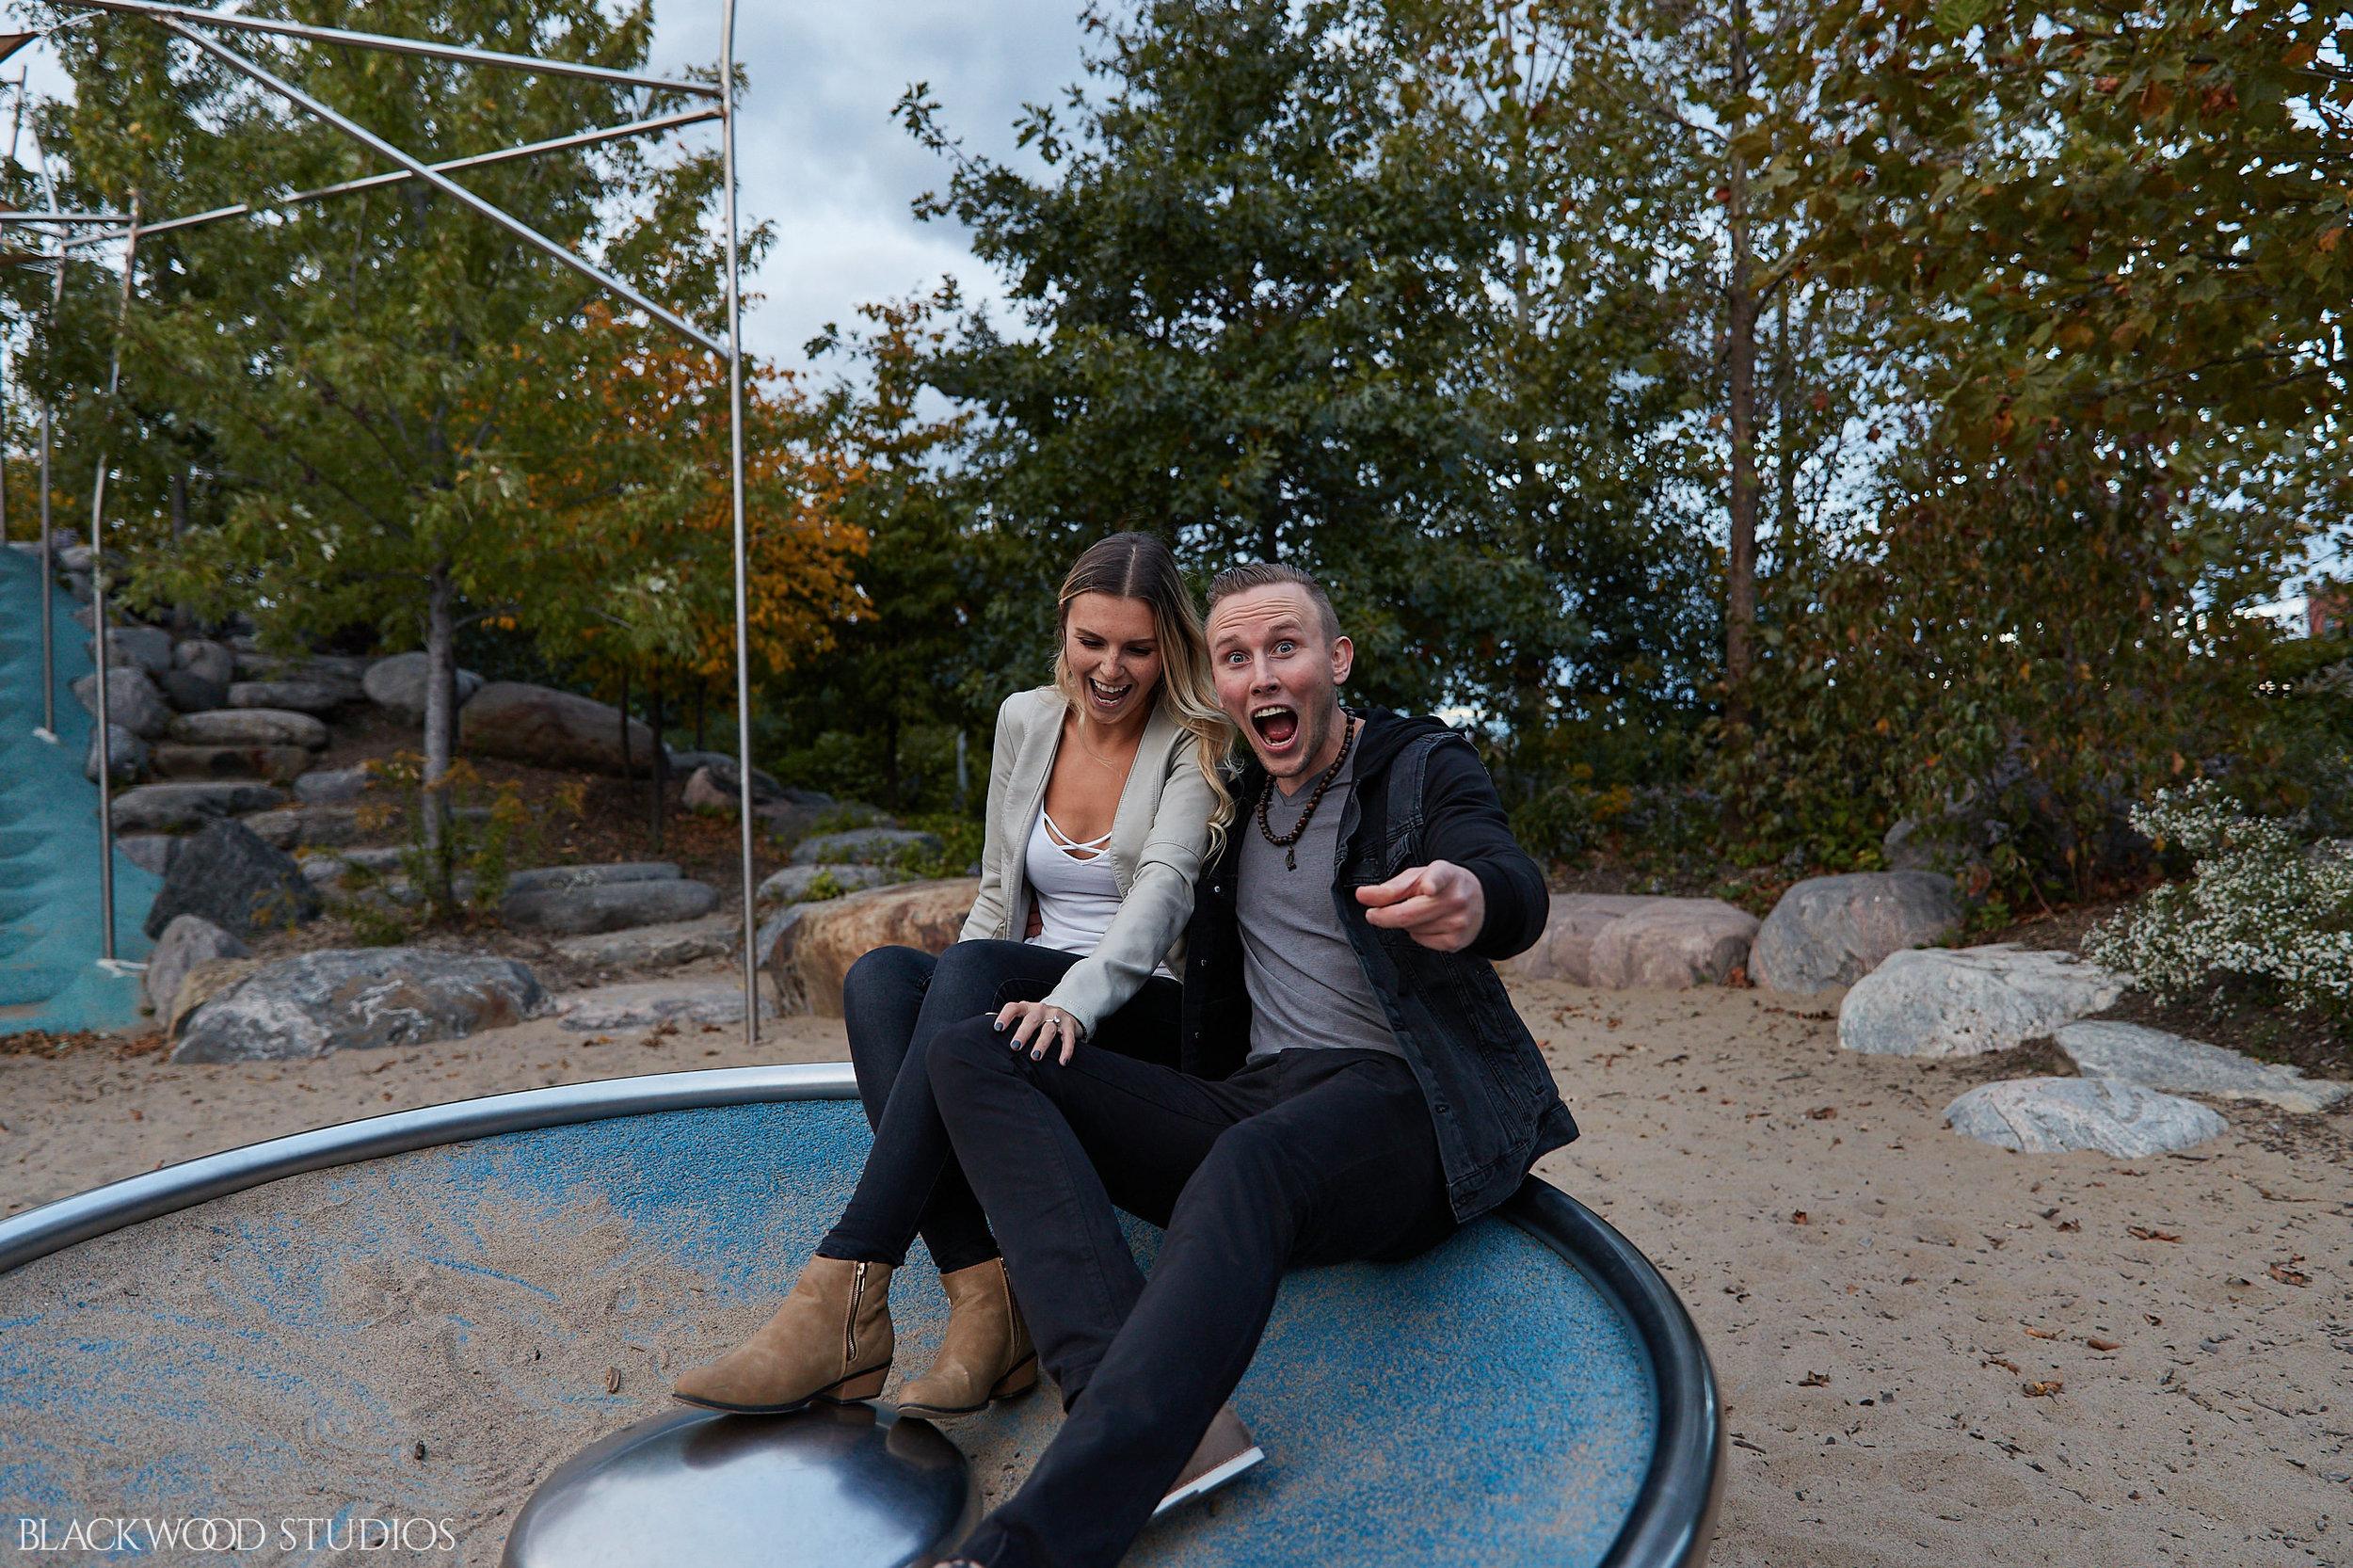 Blackwood-Studios-20181012-181554-Aleisha-and-Brad-Engagement-photography-Toronto-Ontario-Canada-Corktown-Common.jpg